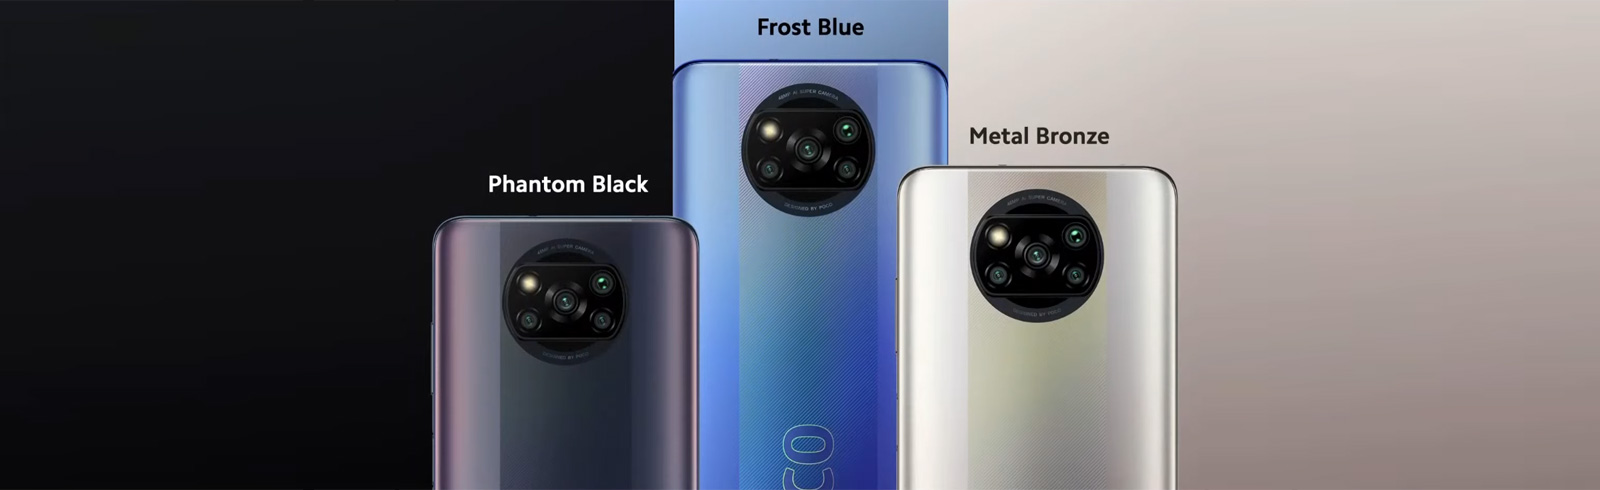 Xiaomi unveils the POCO X3 Pro with Snapdragon 860 mobile platform